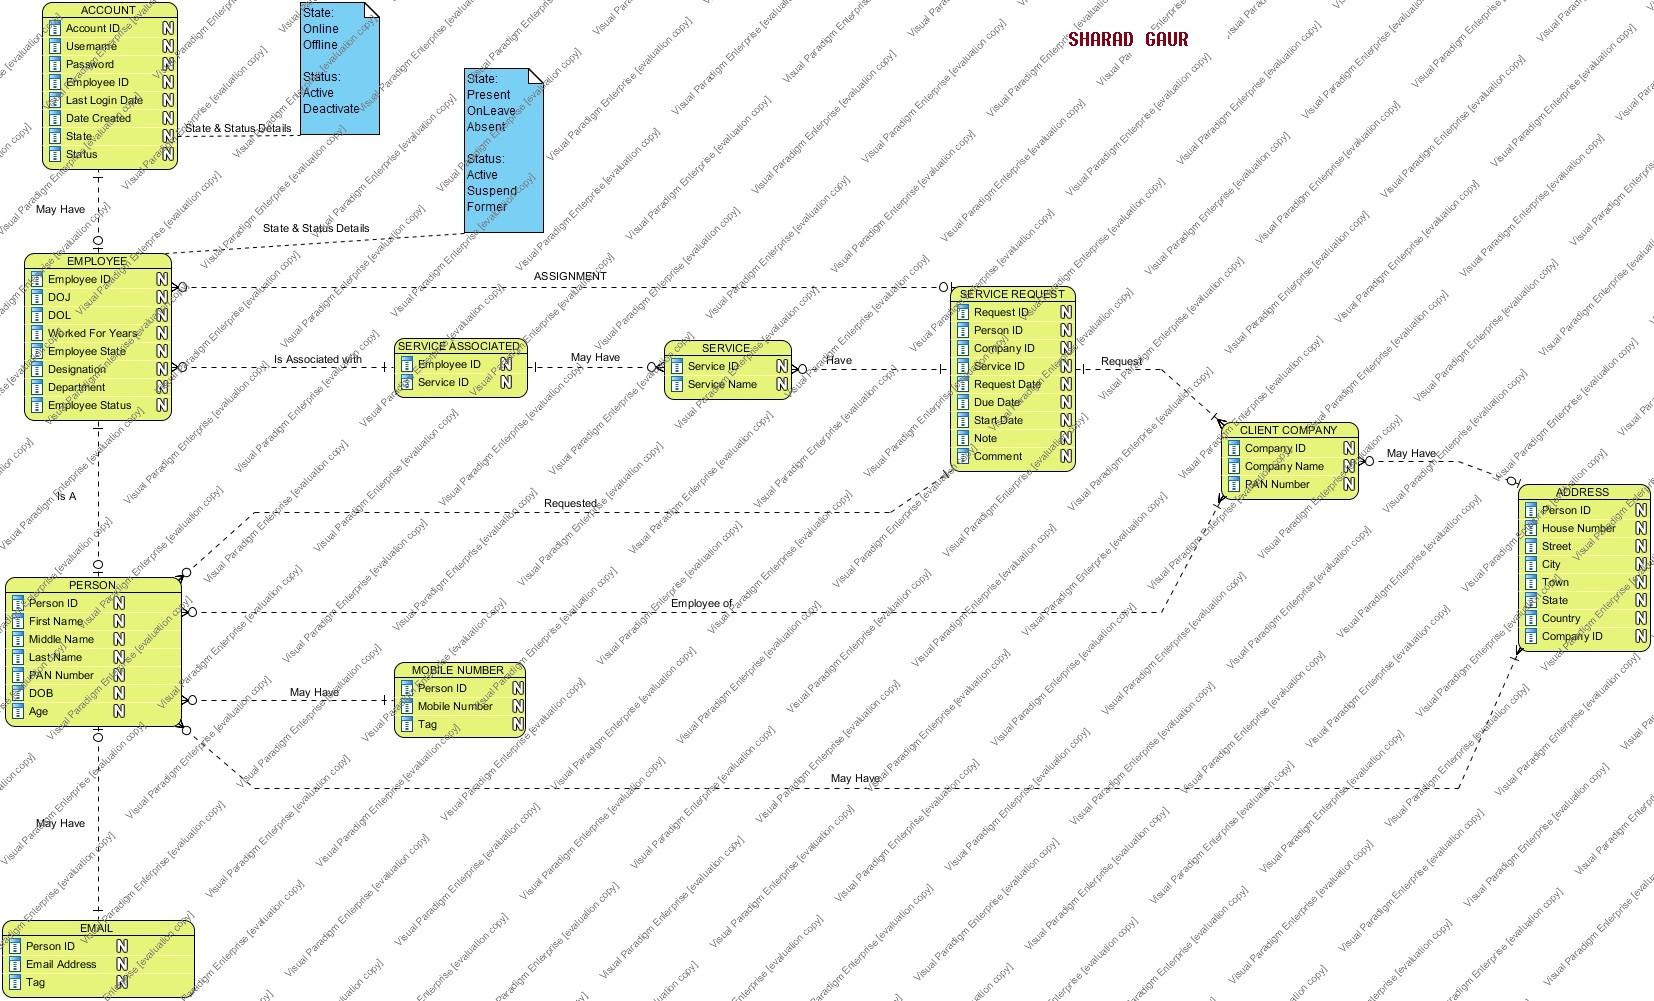 Database Design - Modelling An Entity-Relationship Diagram for An Entity Relationship Diagram